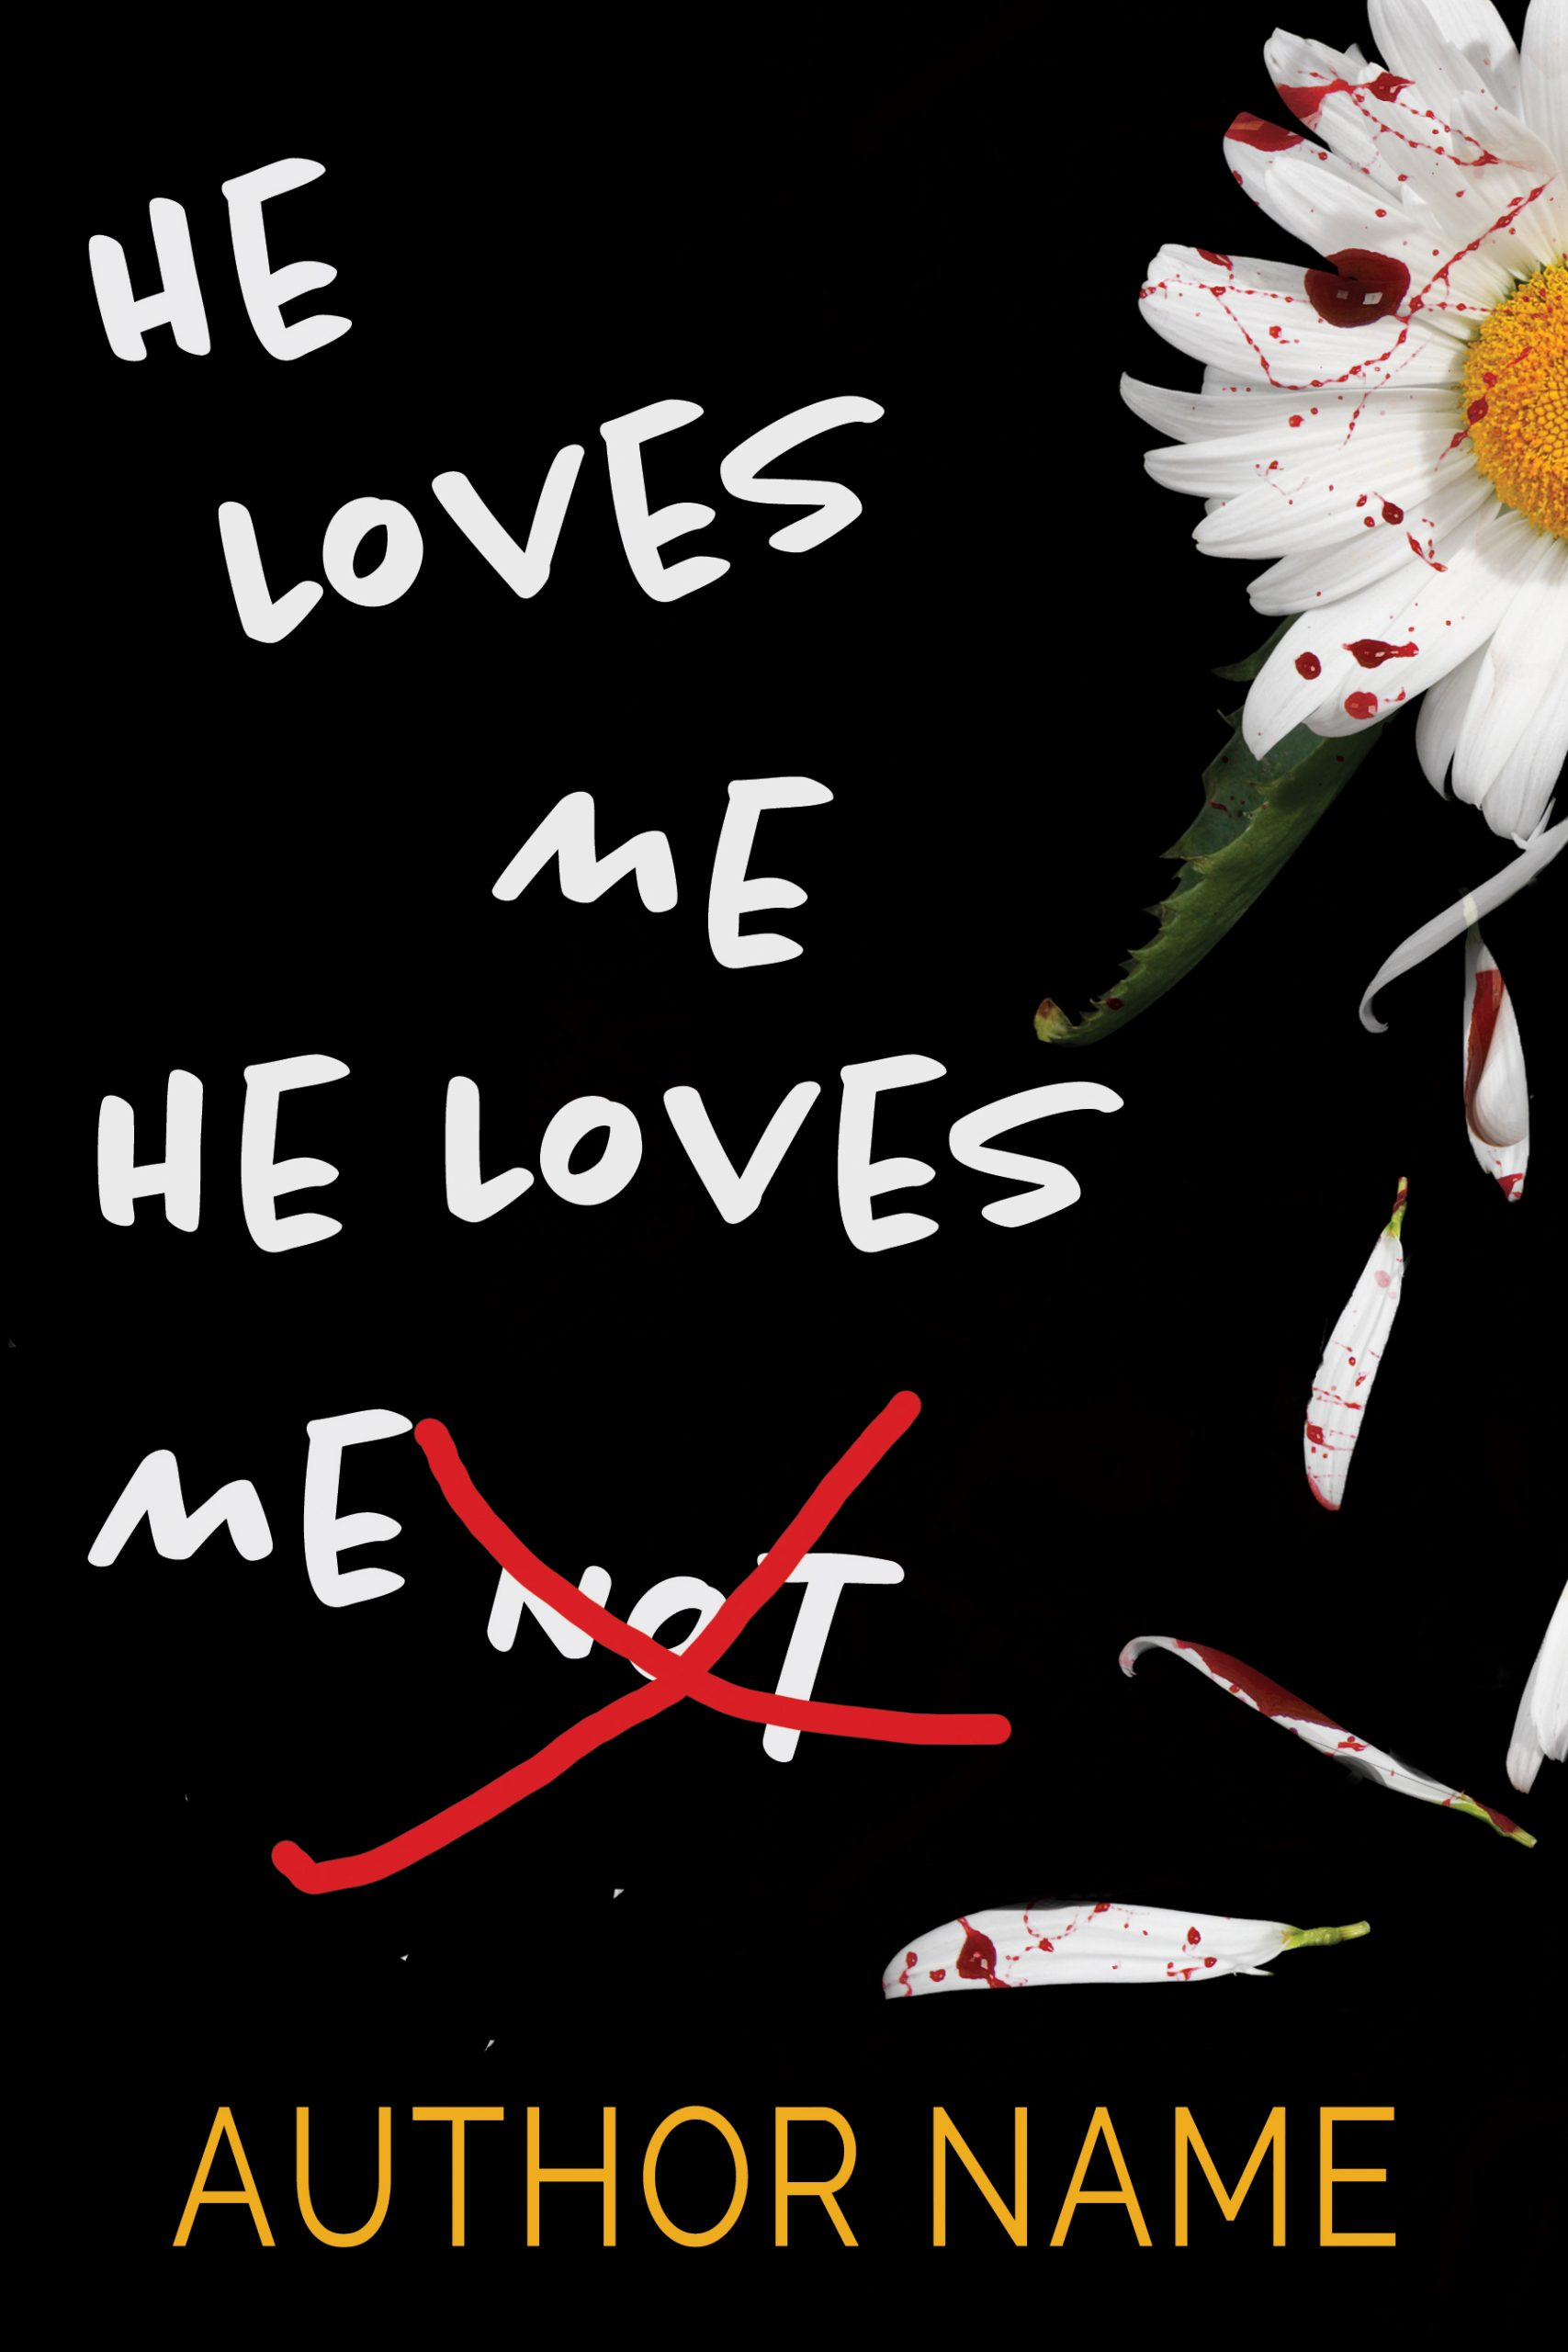 He Loves Me He Loves Me Not Mystery Thriller Premade Book Cover